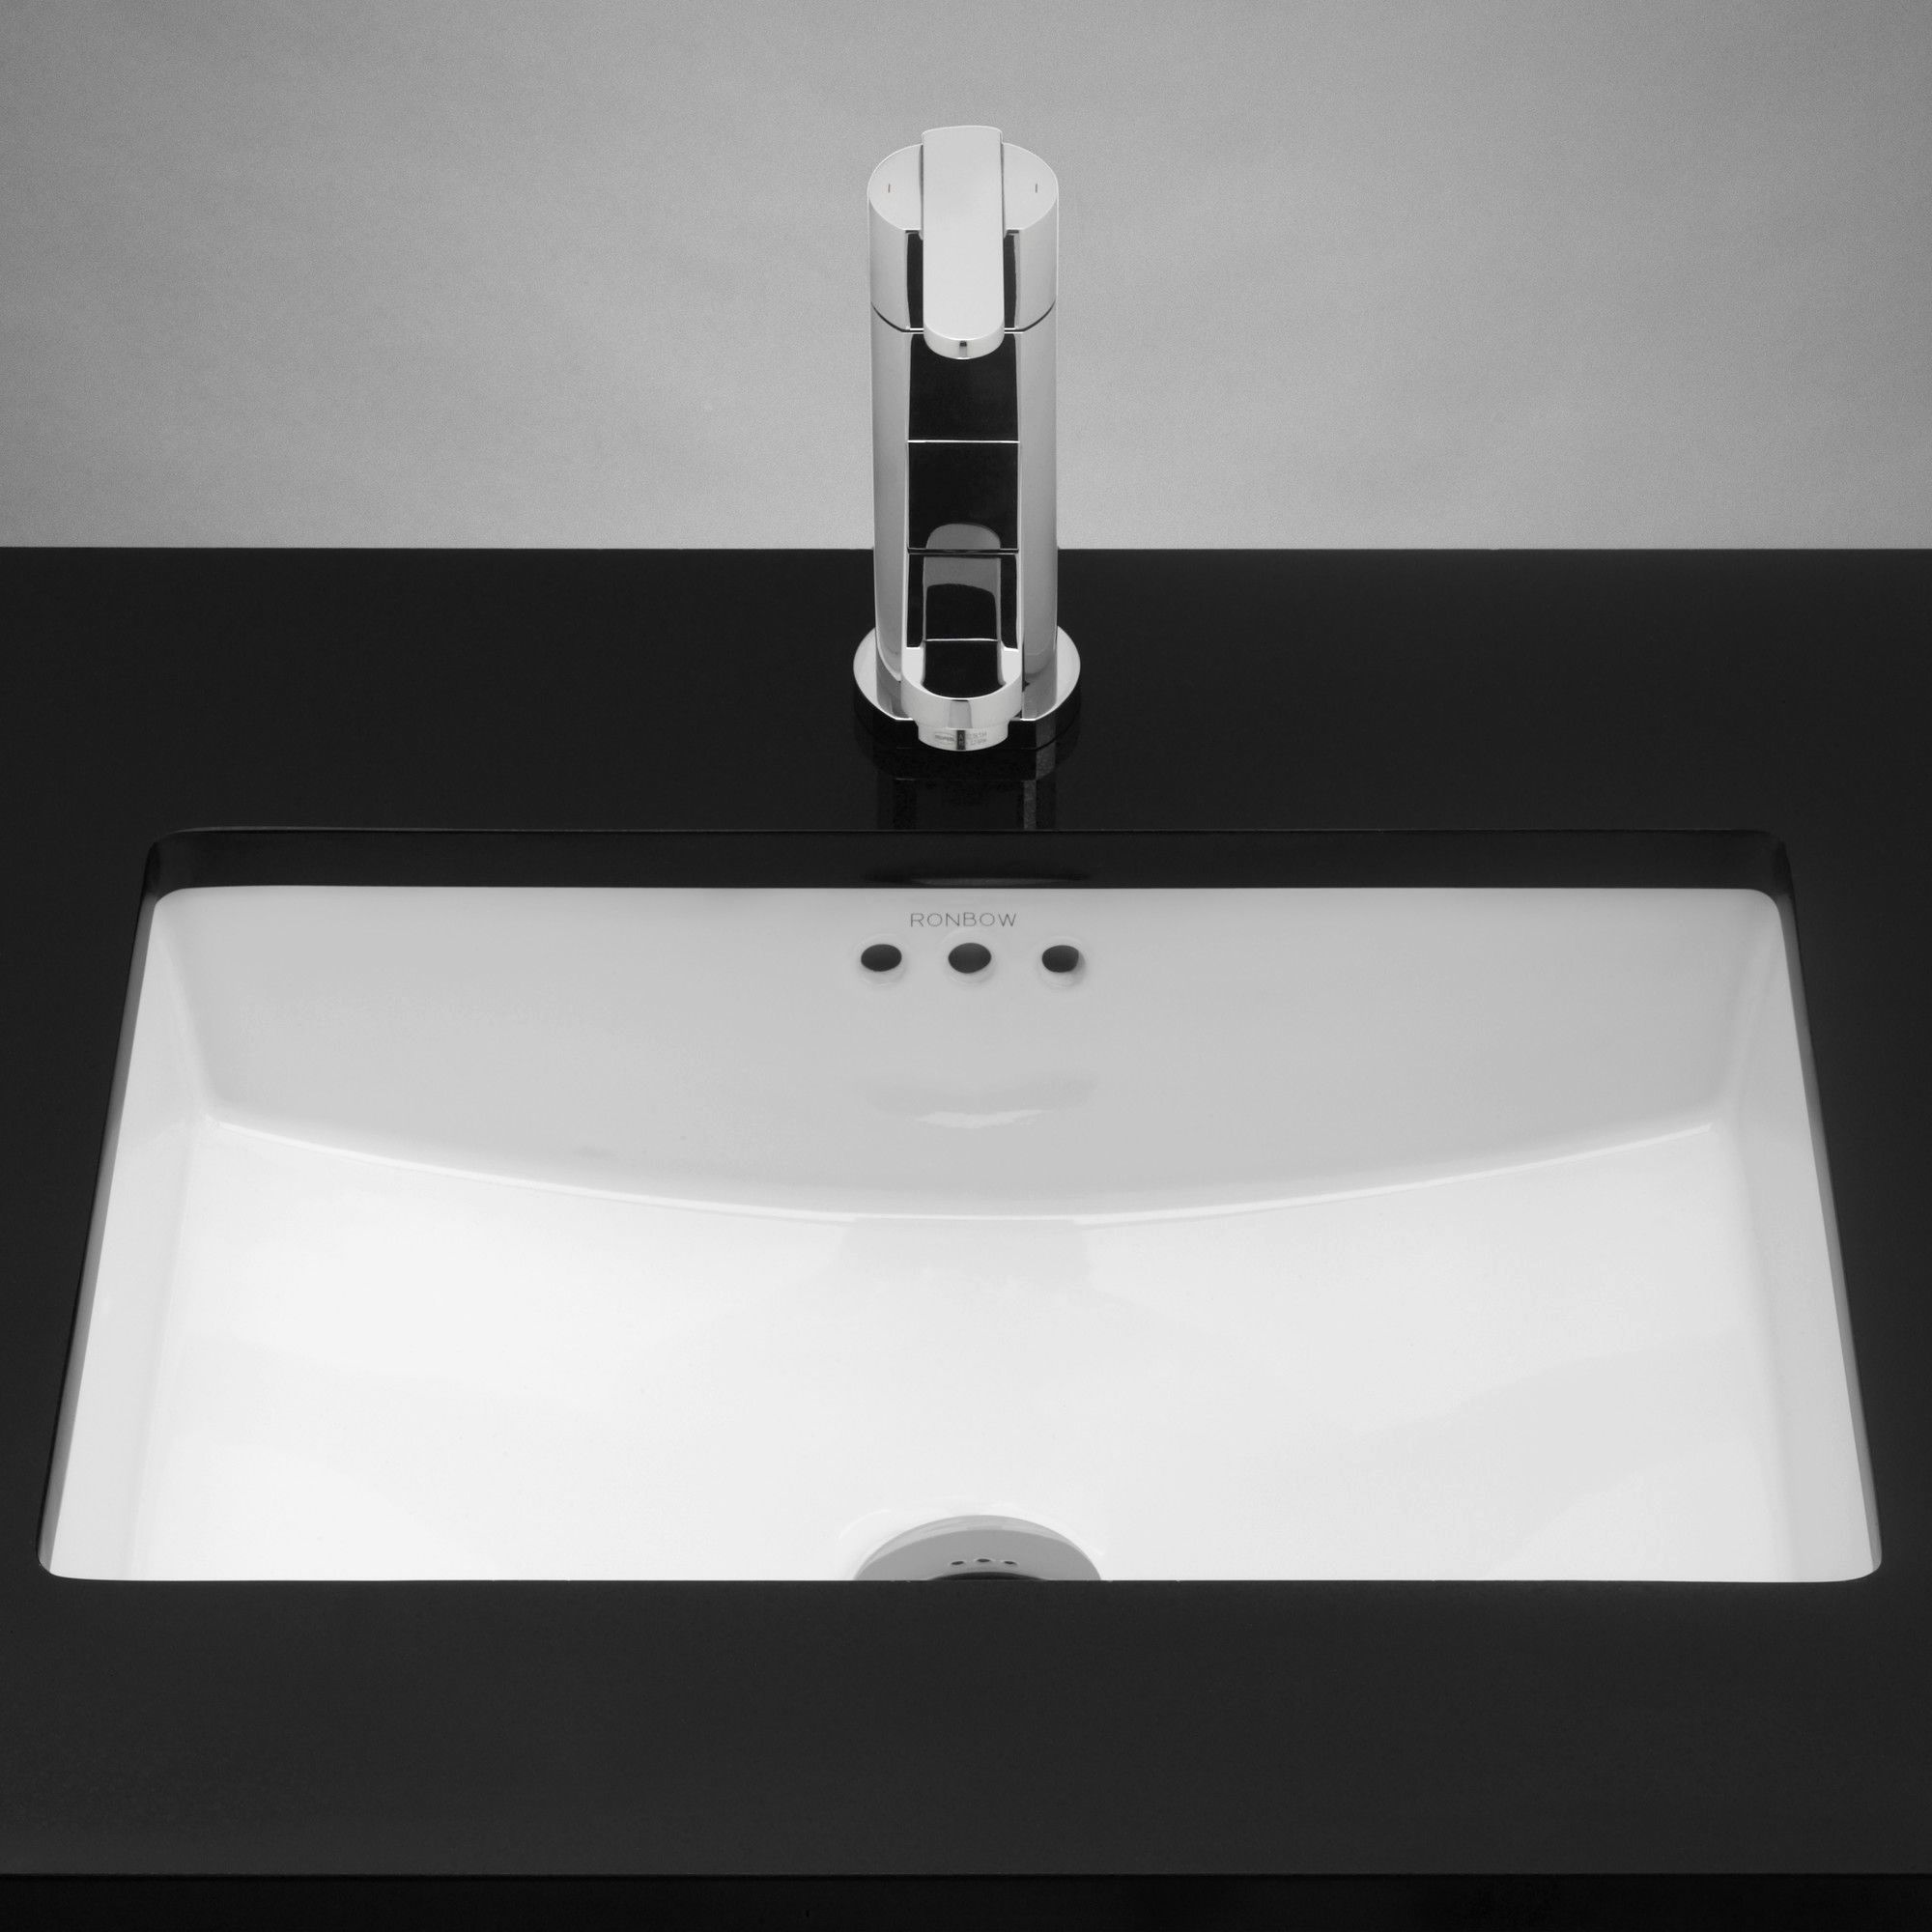 Kohler Kathryn Kohler Undermount Sink Square Bathroom Sink